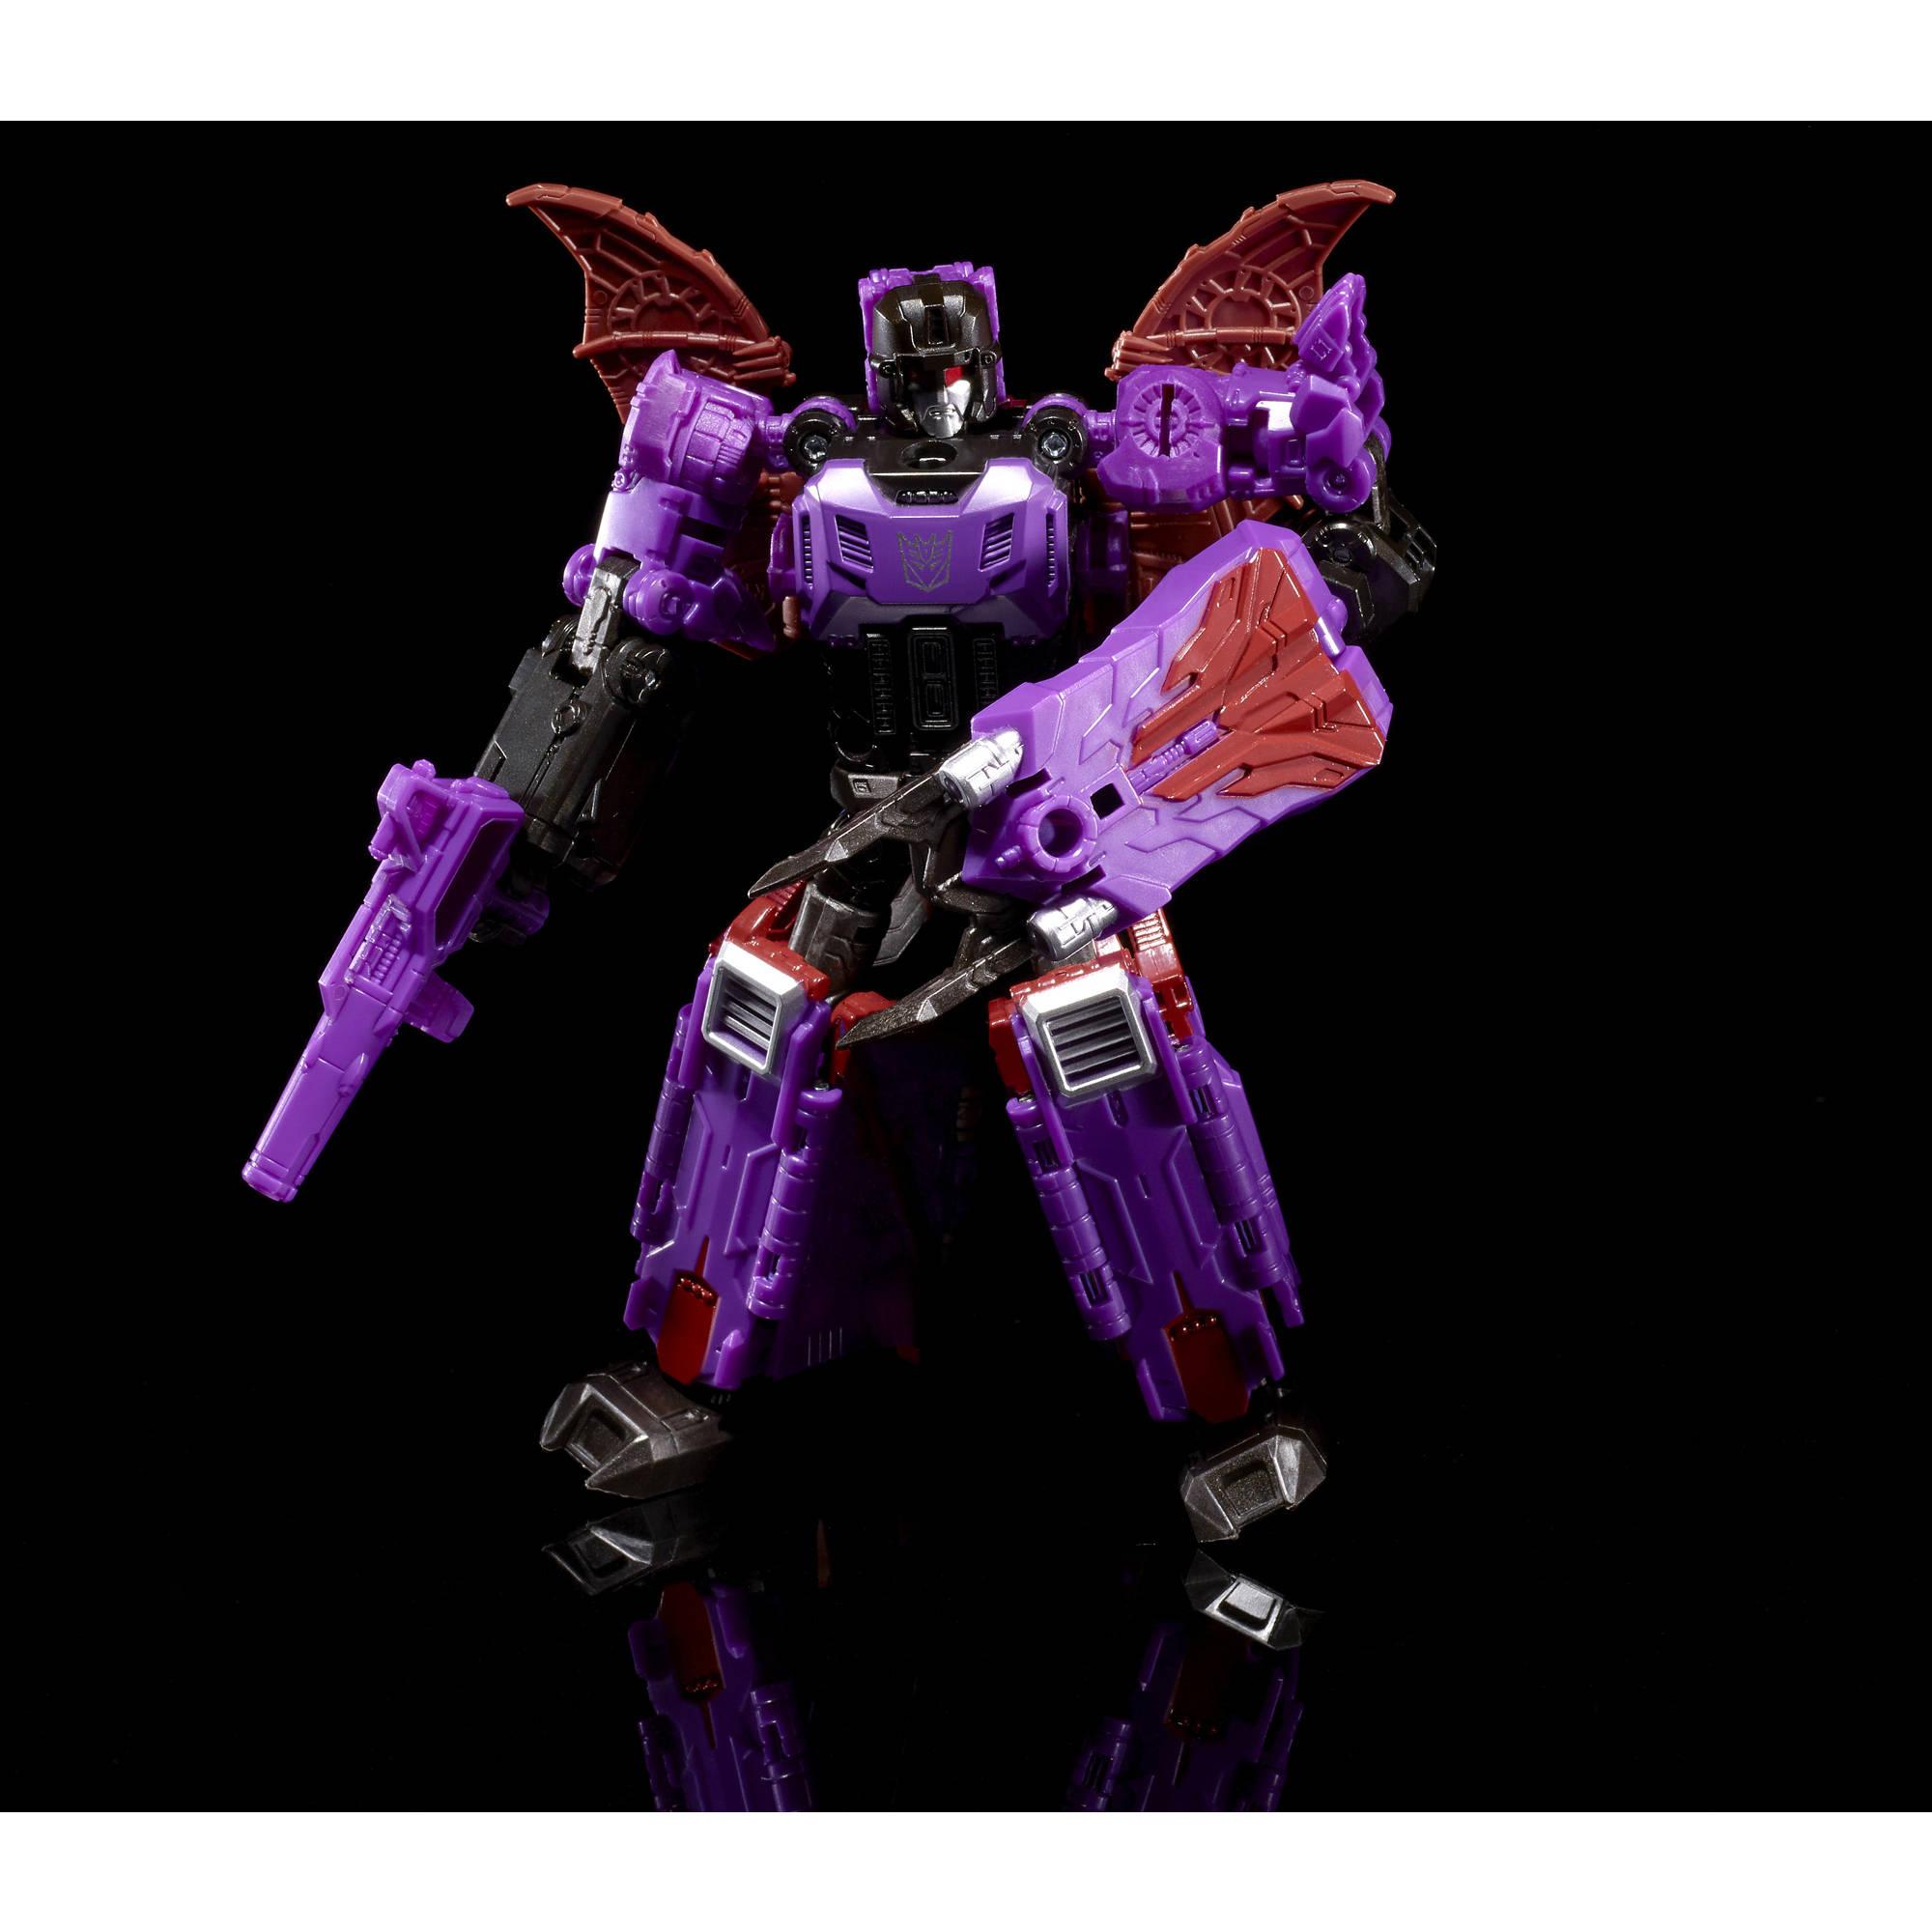 Transformers-hasbro Transformers Gen Deluxe Mindwipe